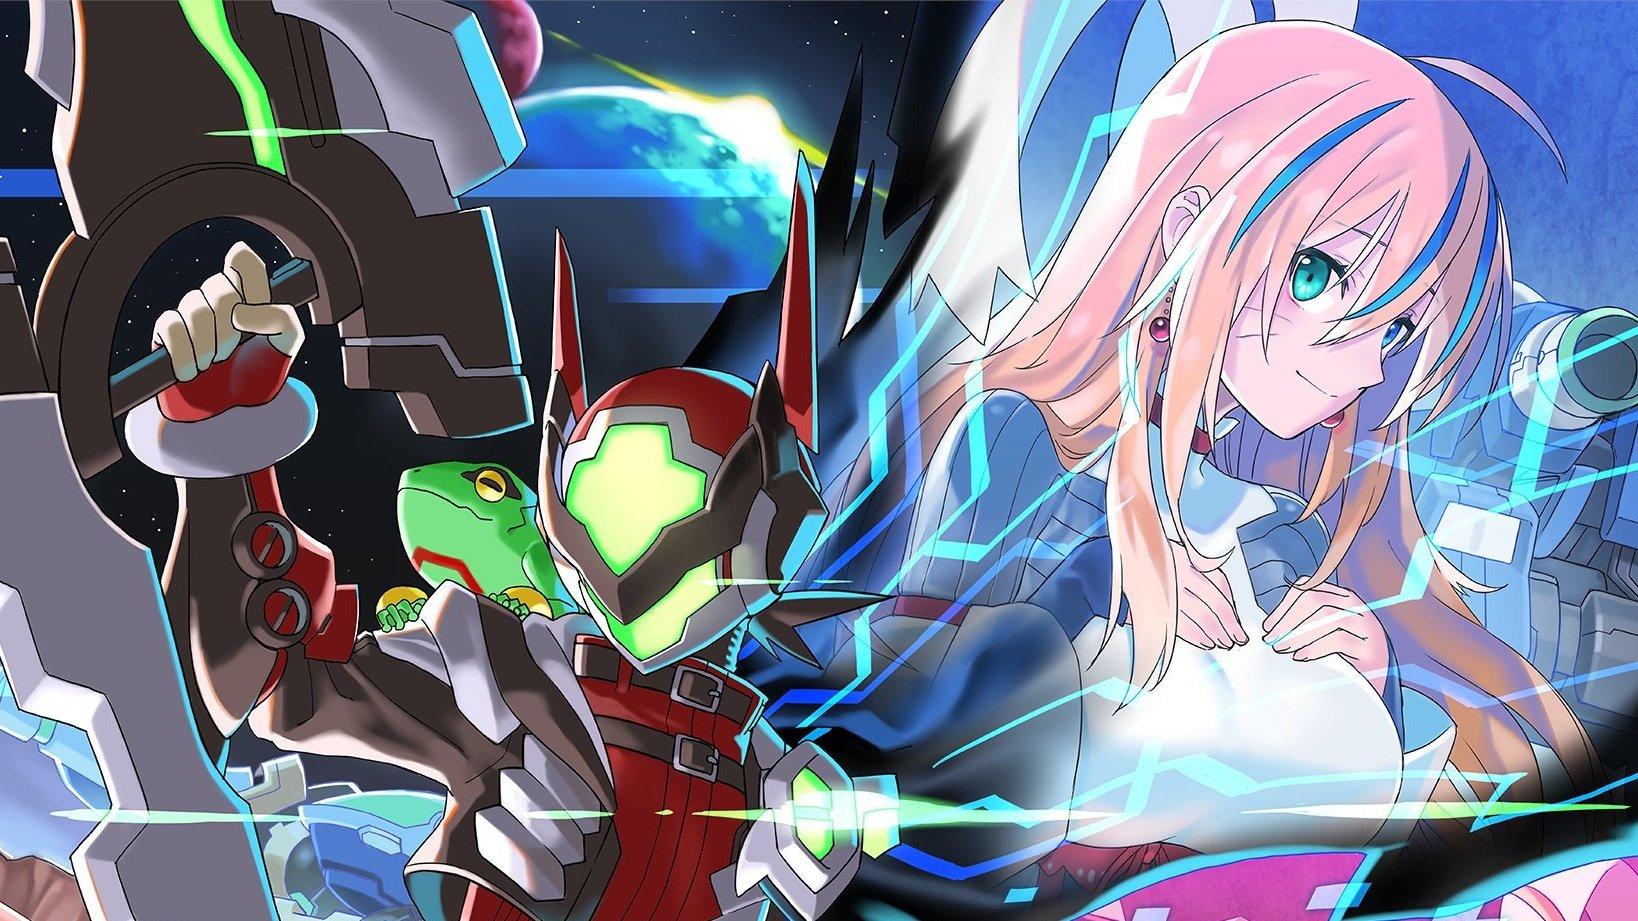 Annonce du jeu Blaster Master Zero IIIl